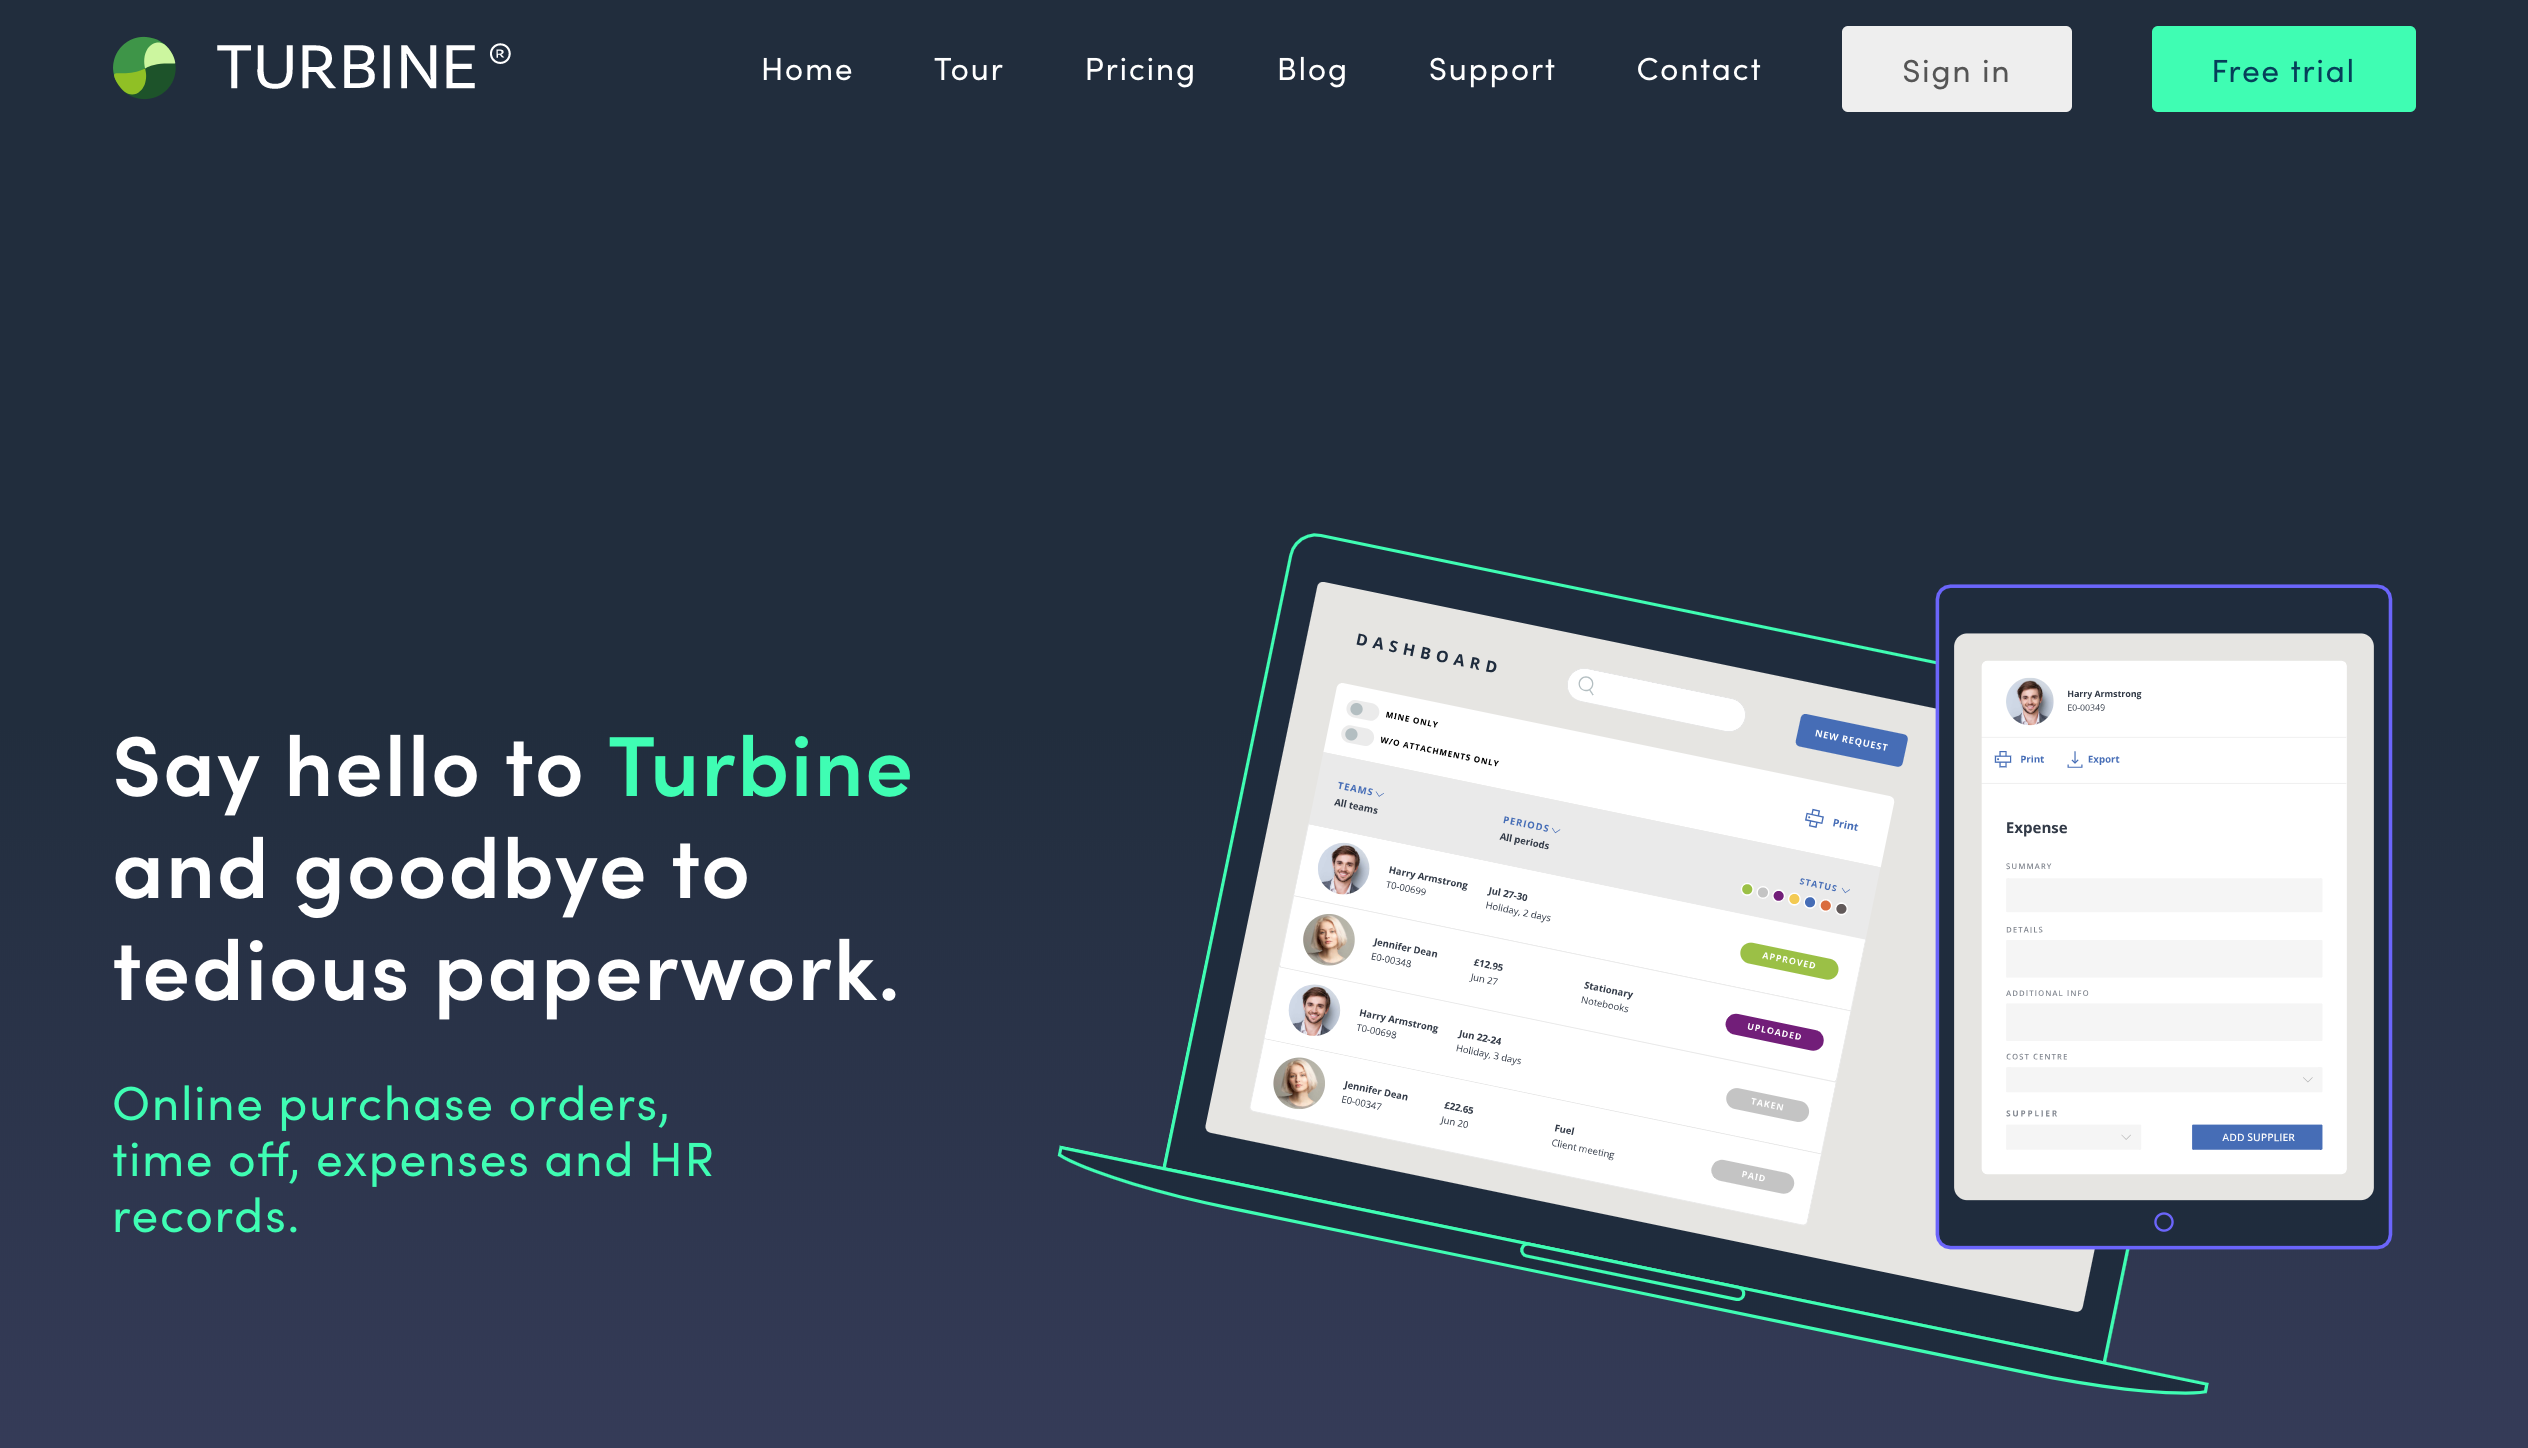 Turbine's 2018 home screen